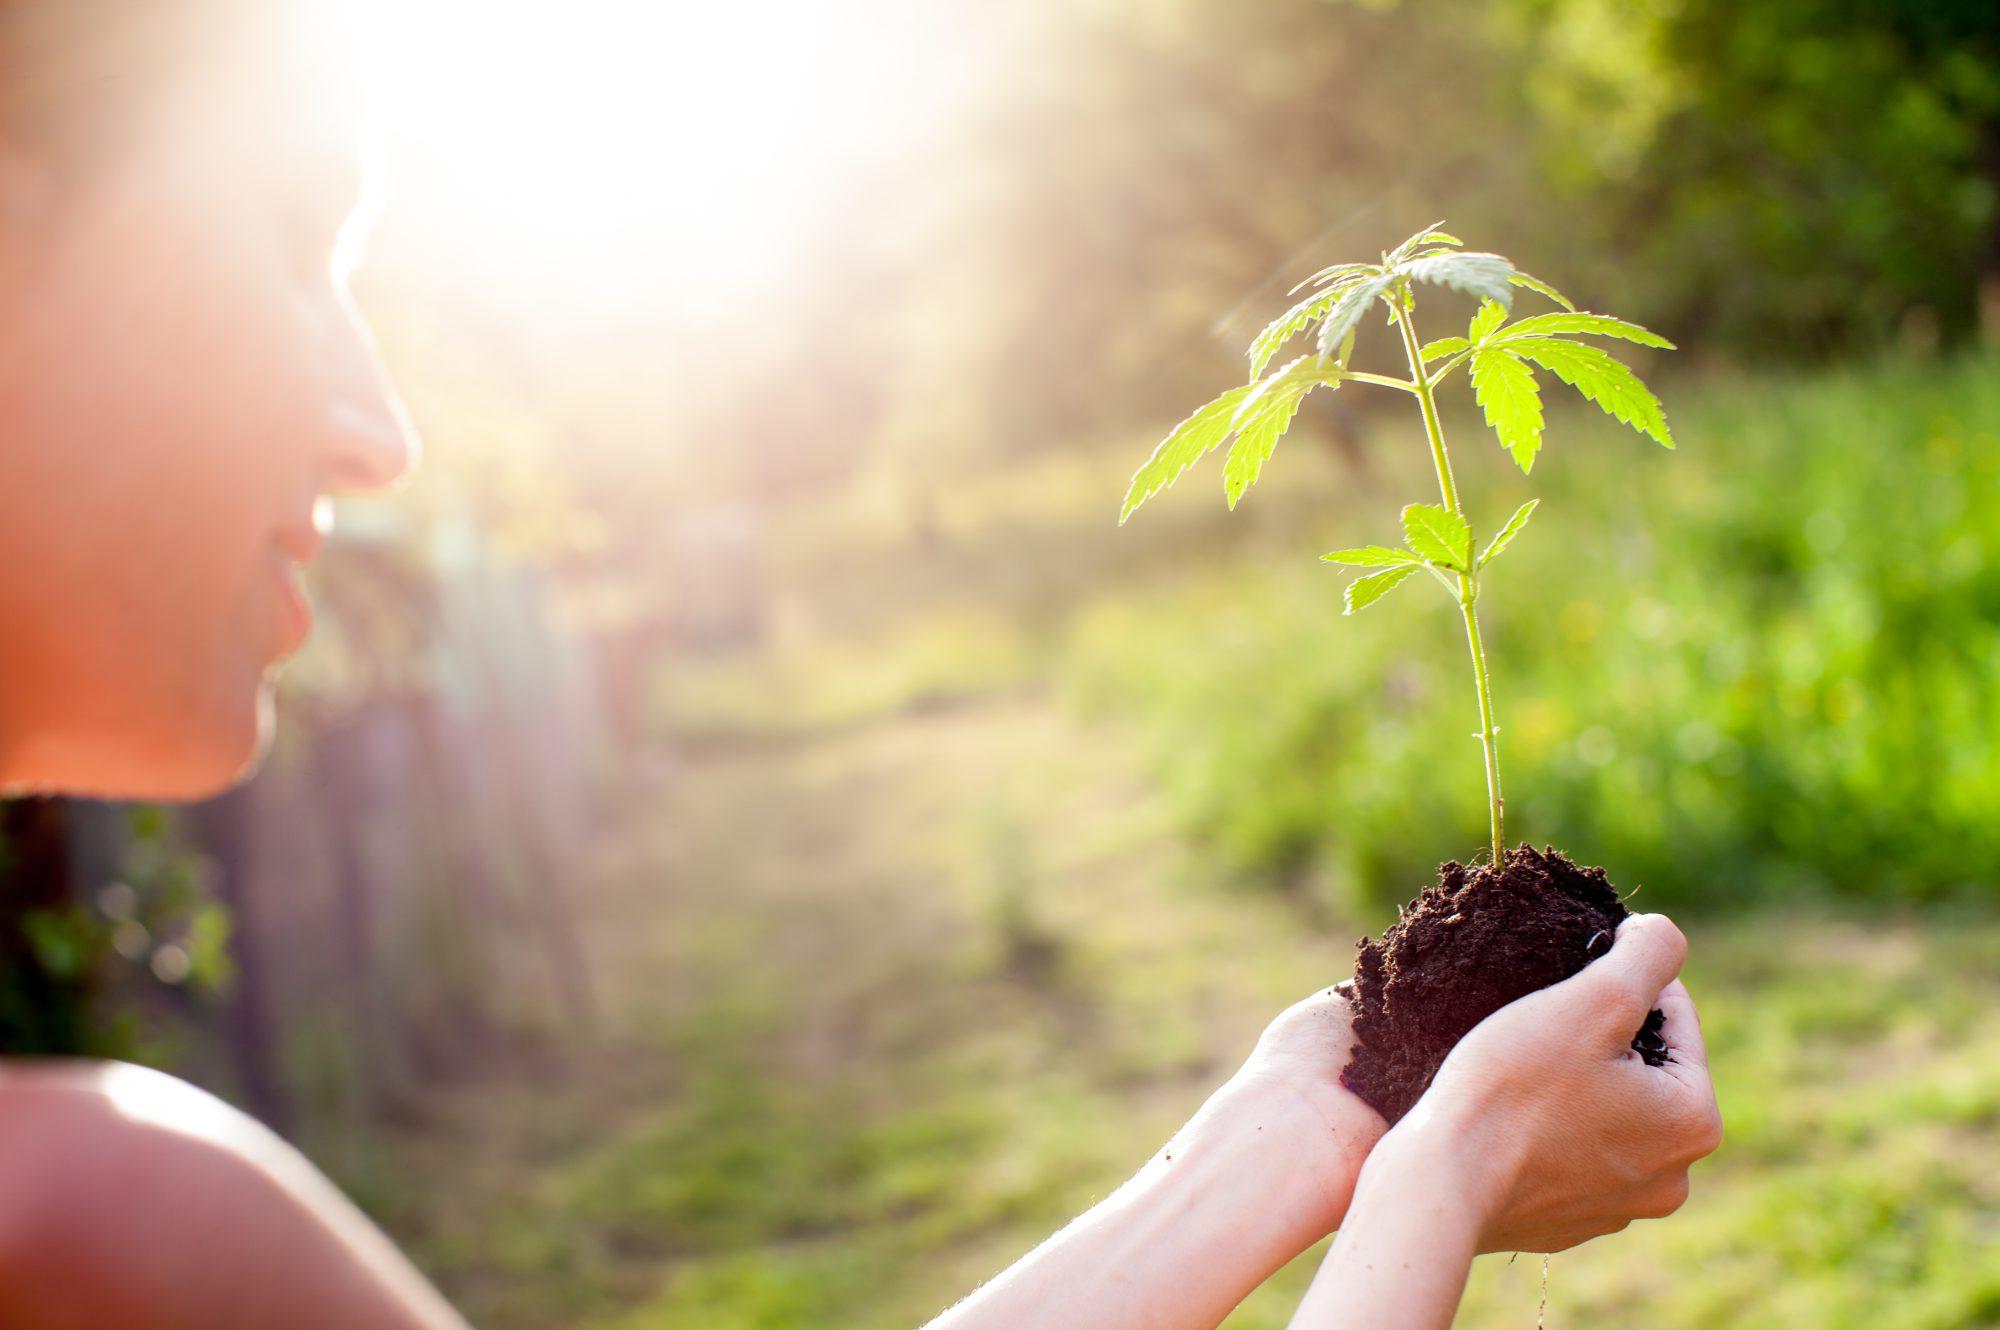 Be-Grow GmbH